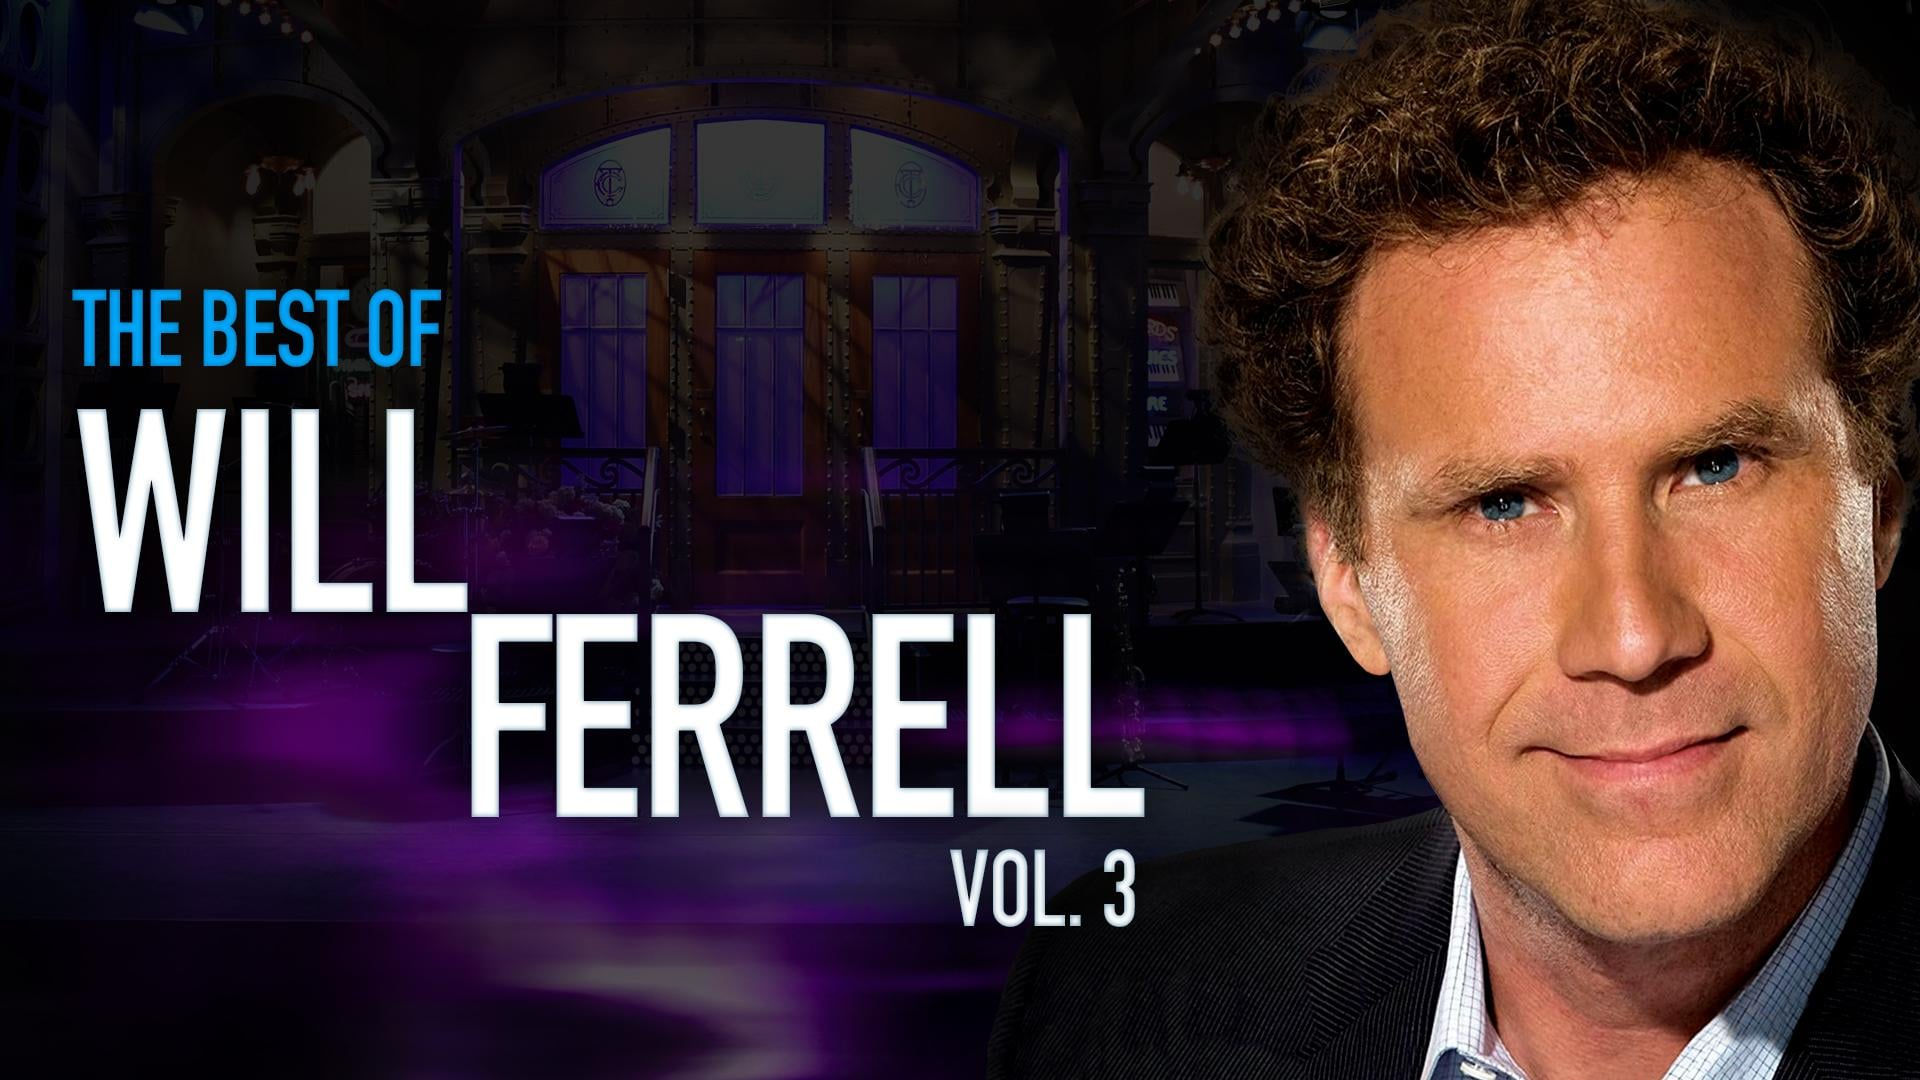 The Best of Will Ferrell Vol. 3